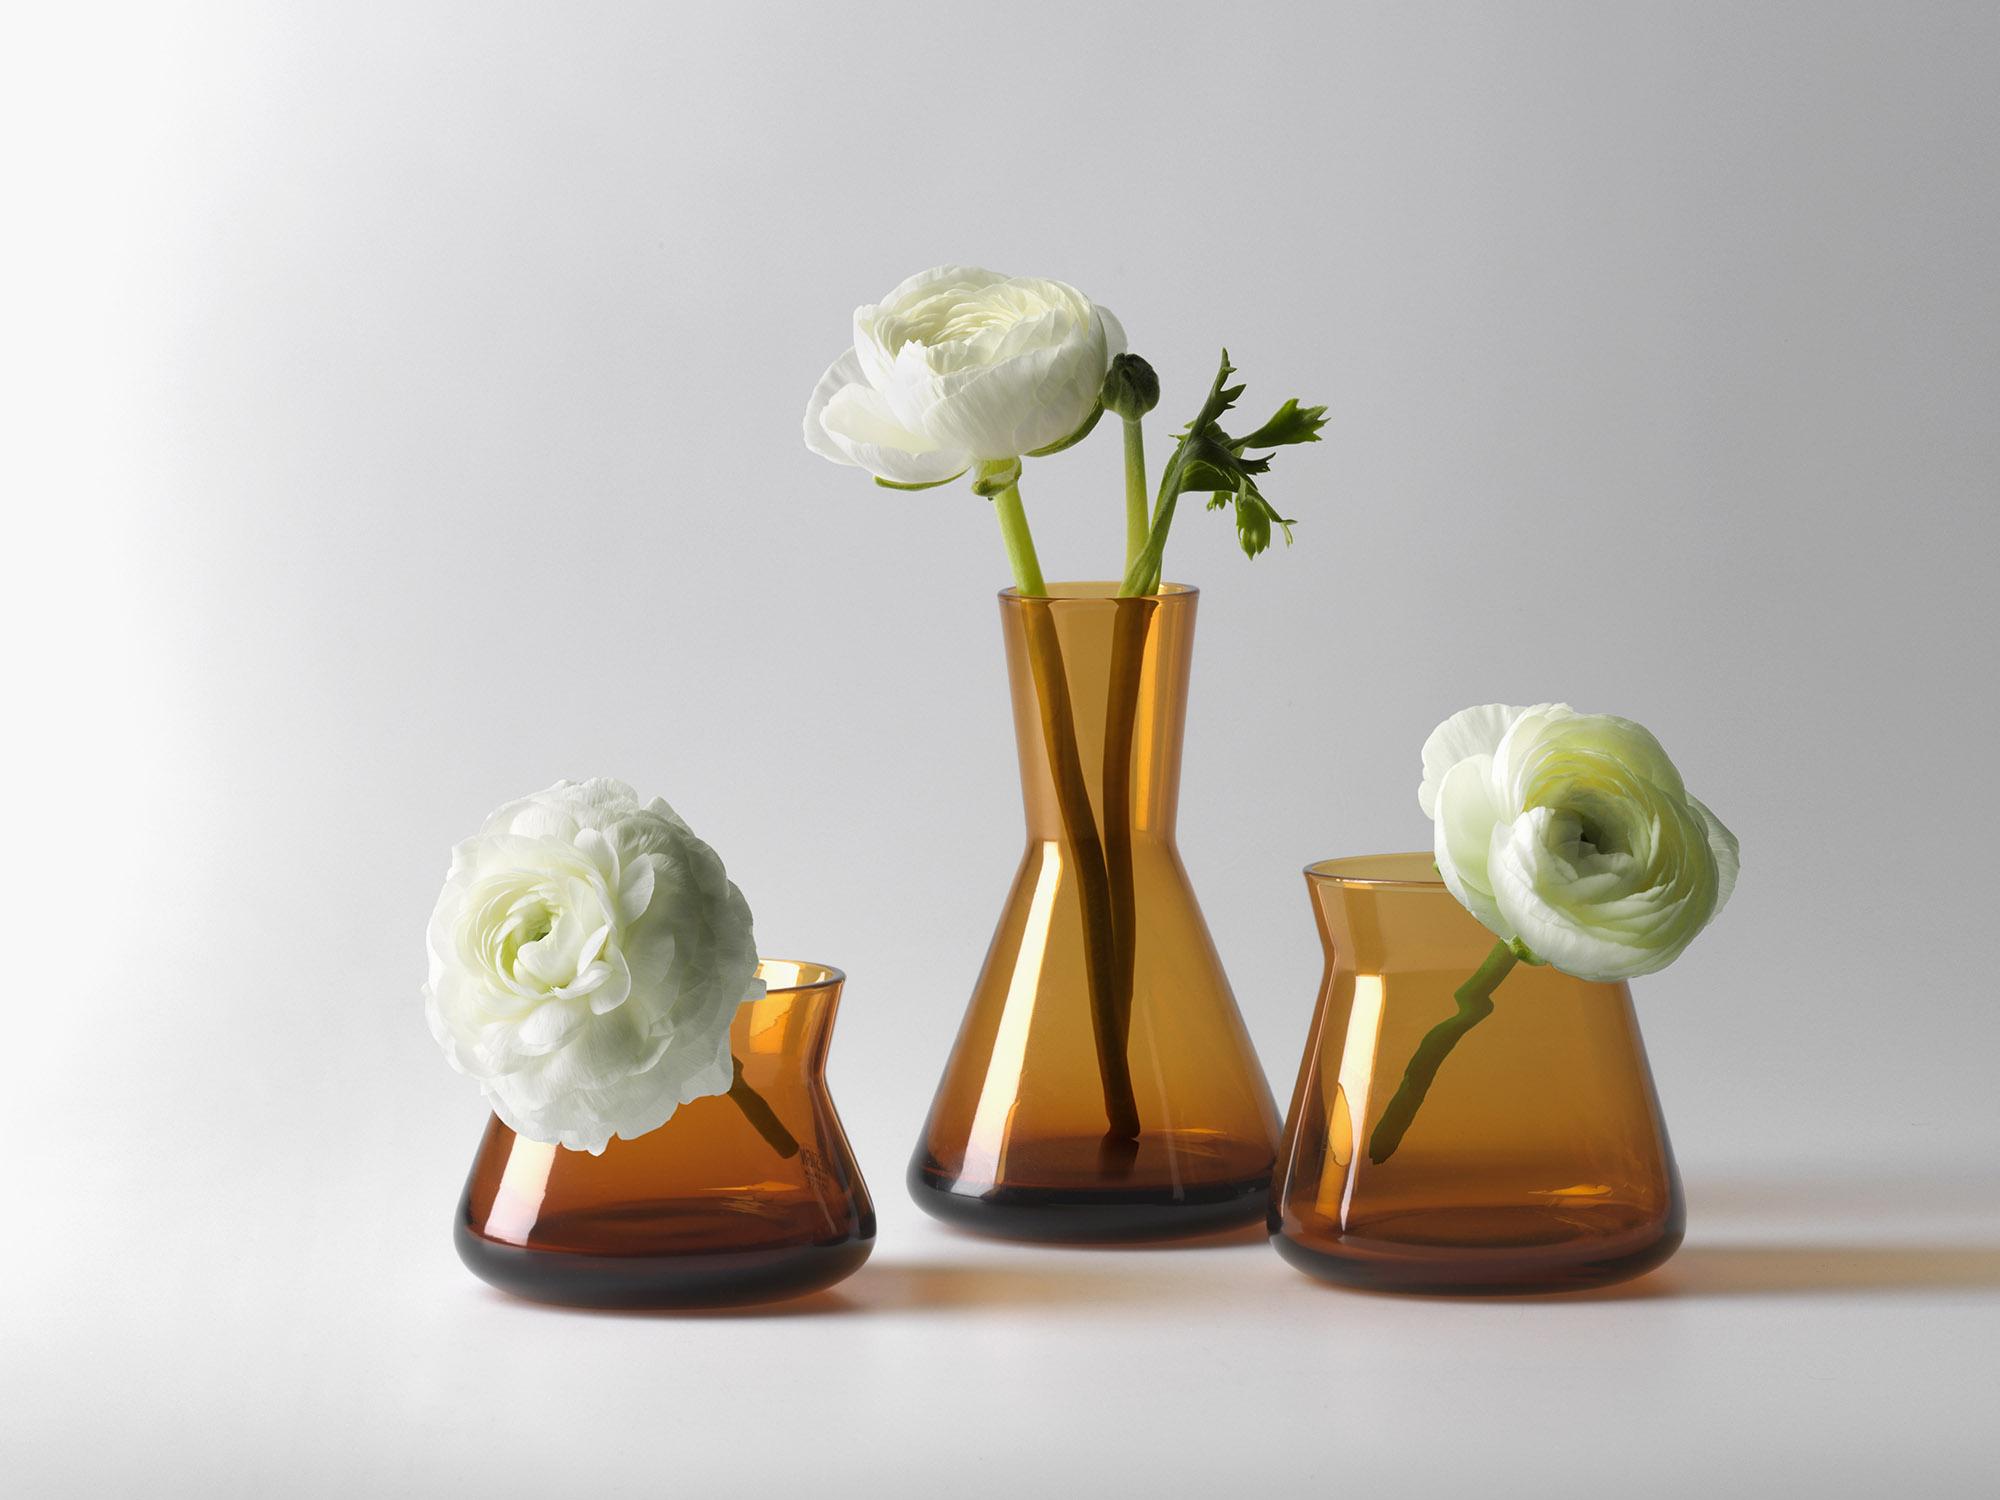 Trio_amber_flower1_2000x1500